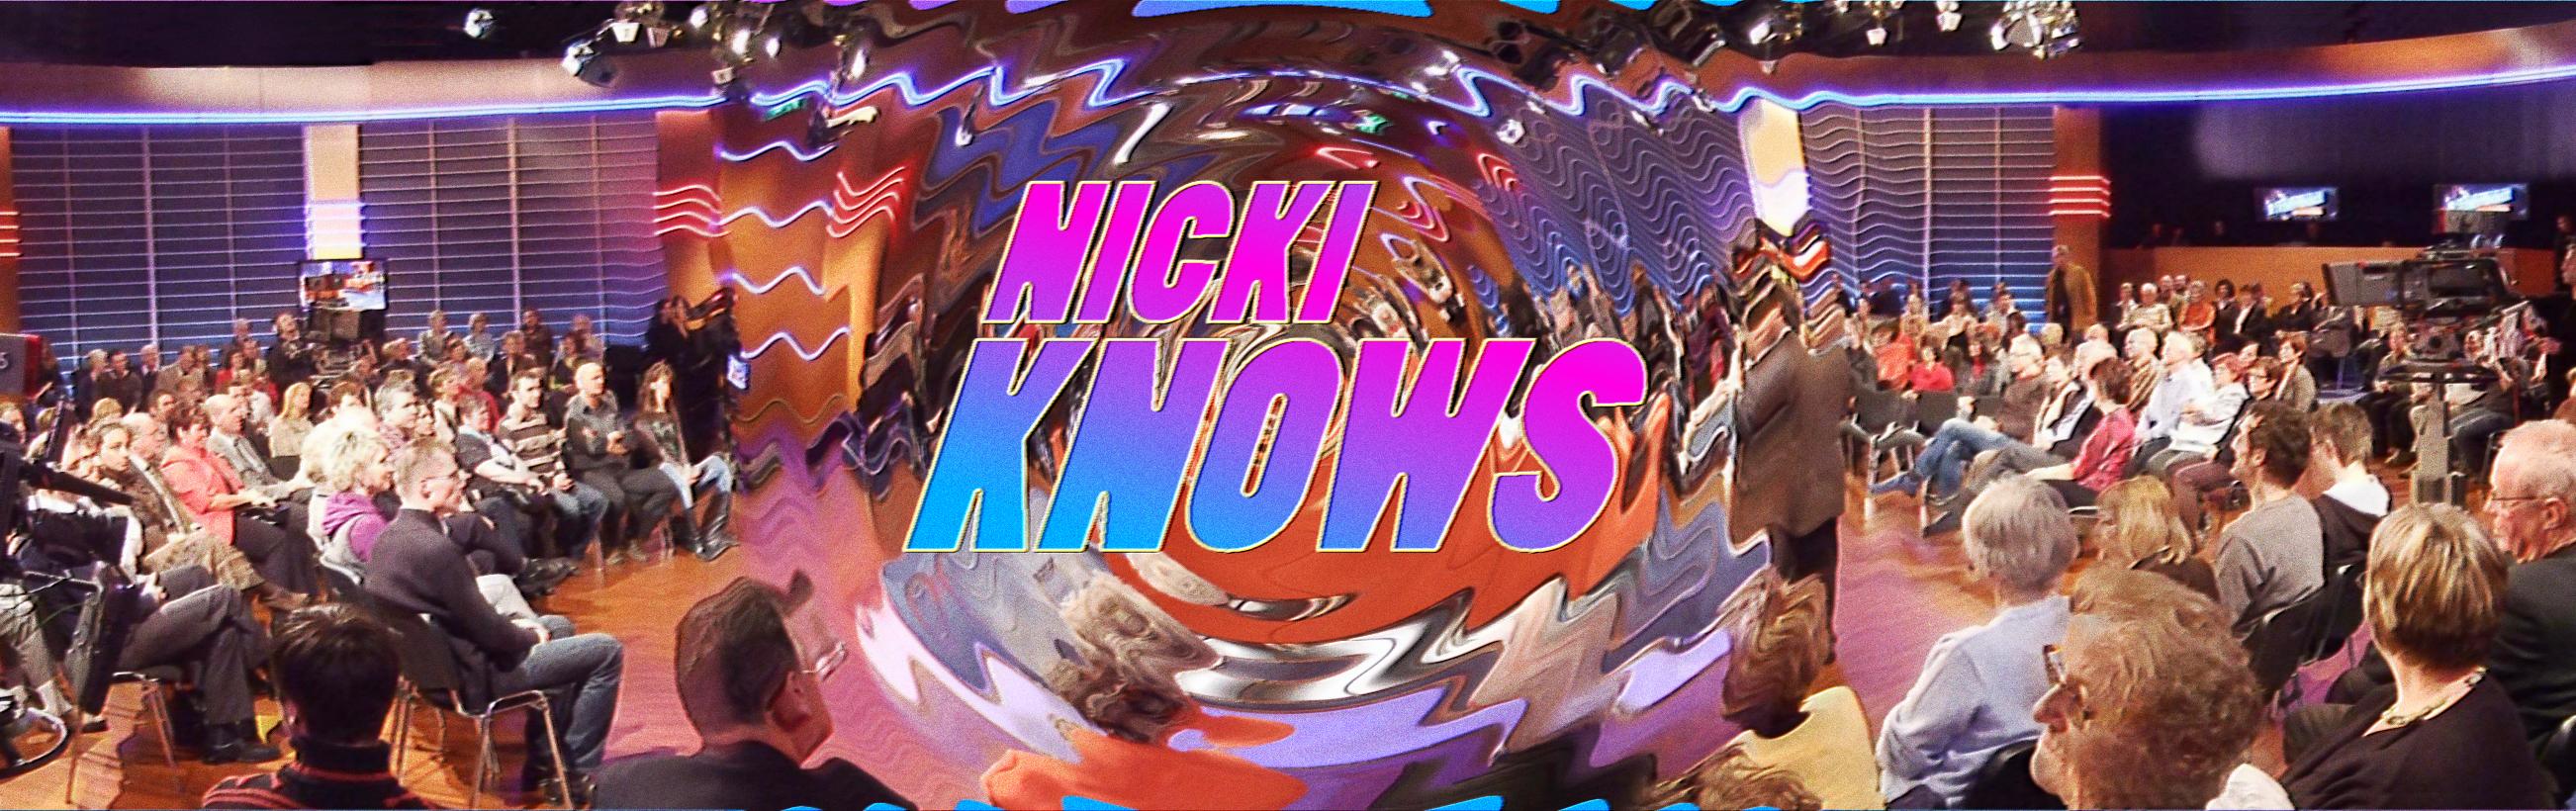 NICKIKNOWS.png